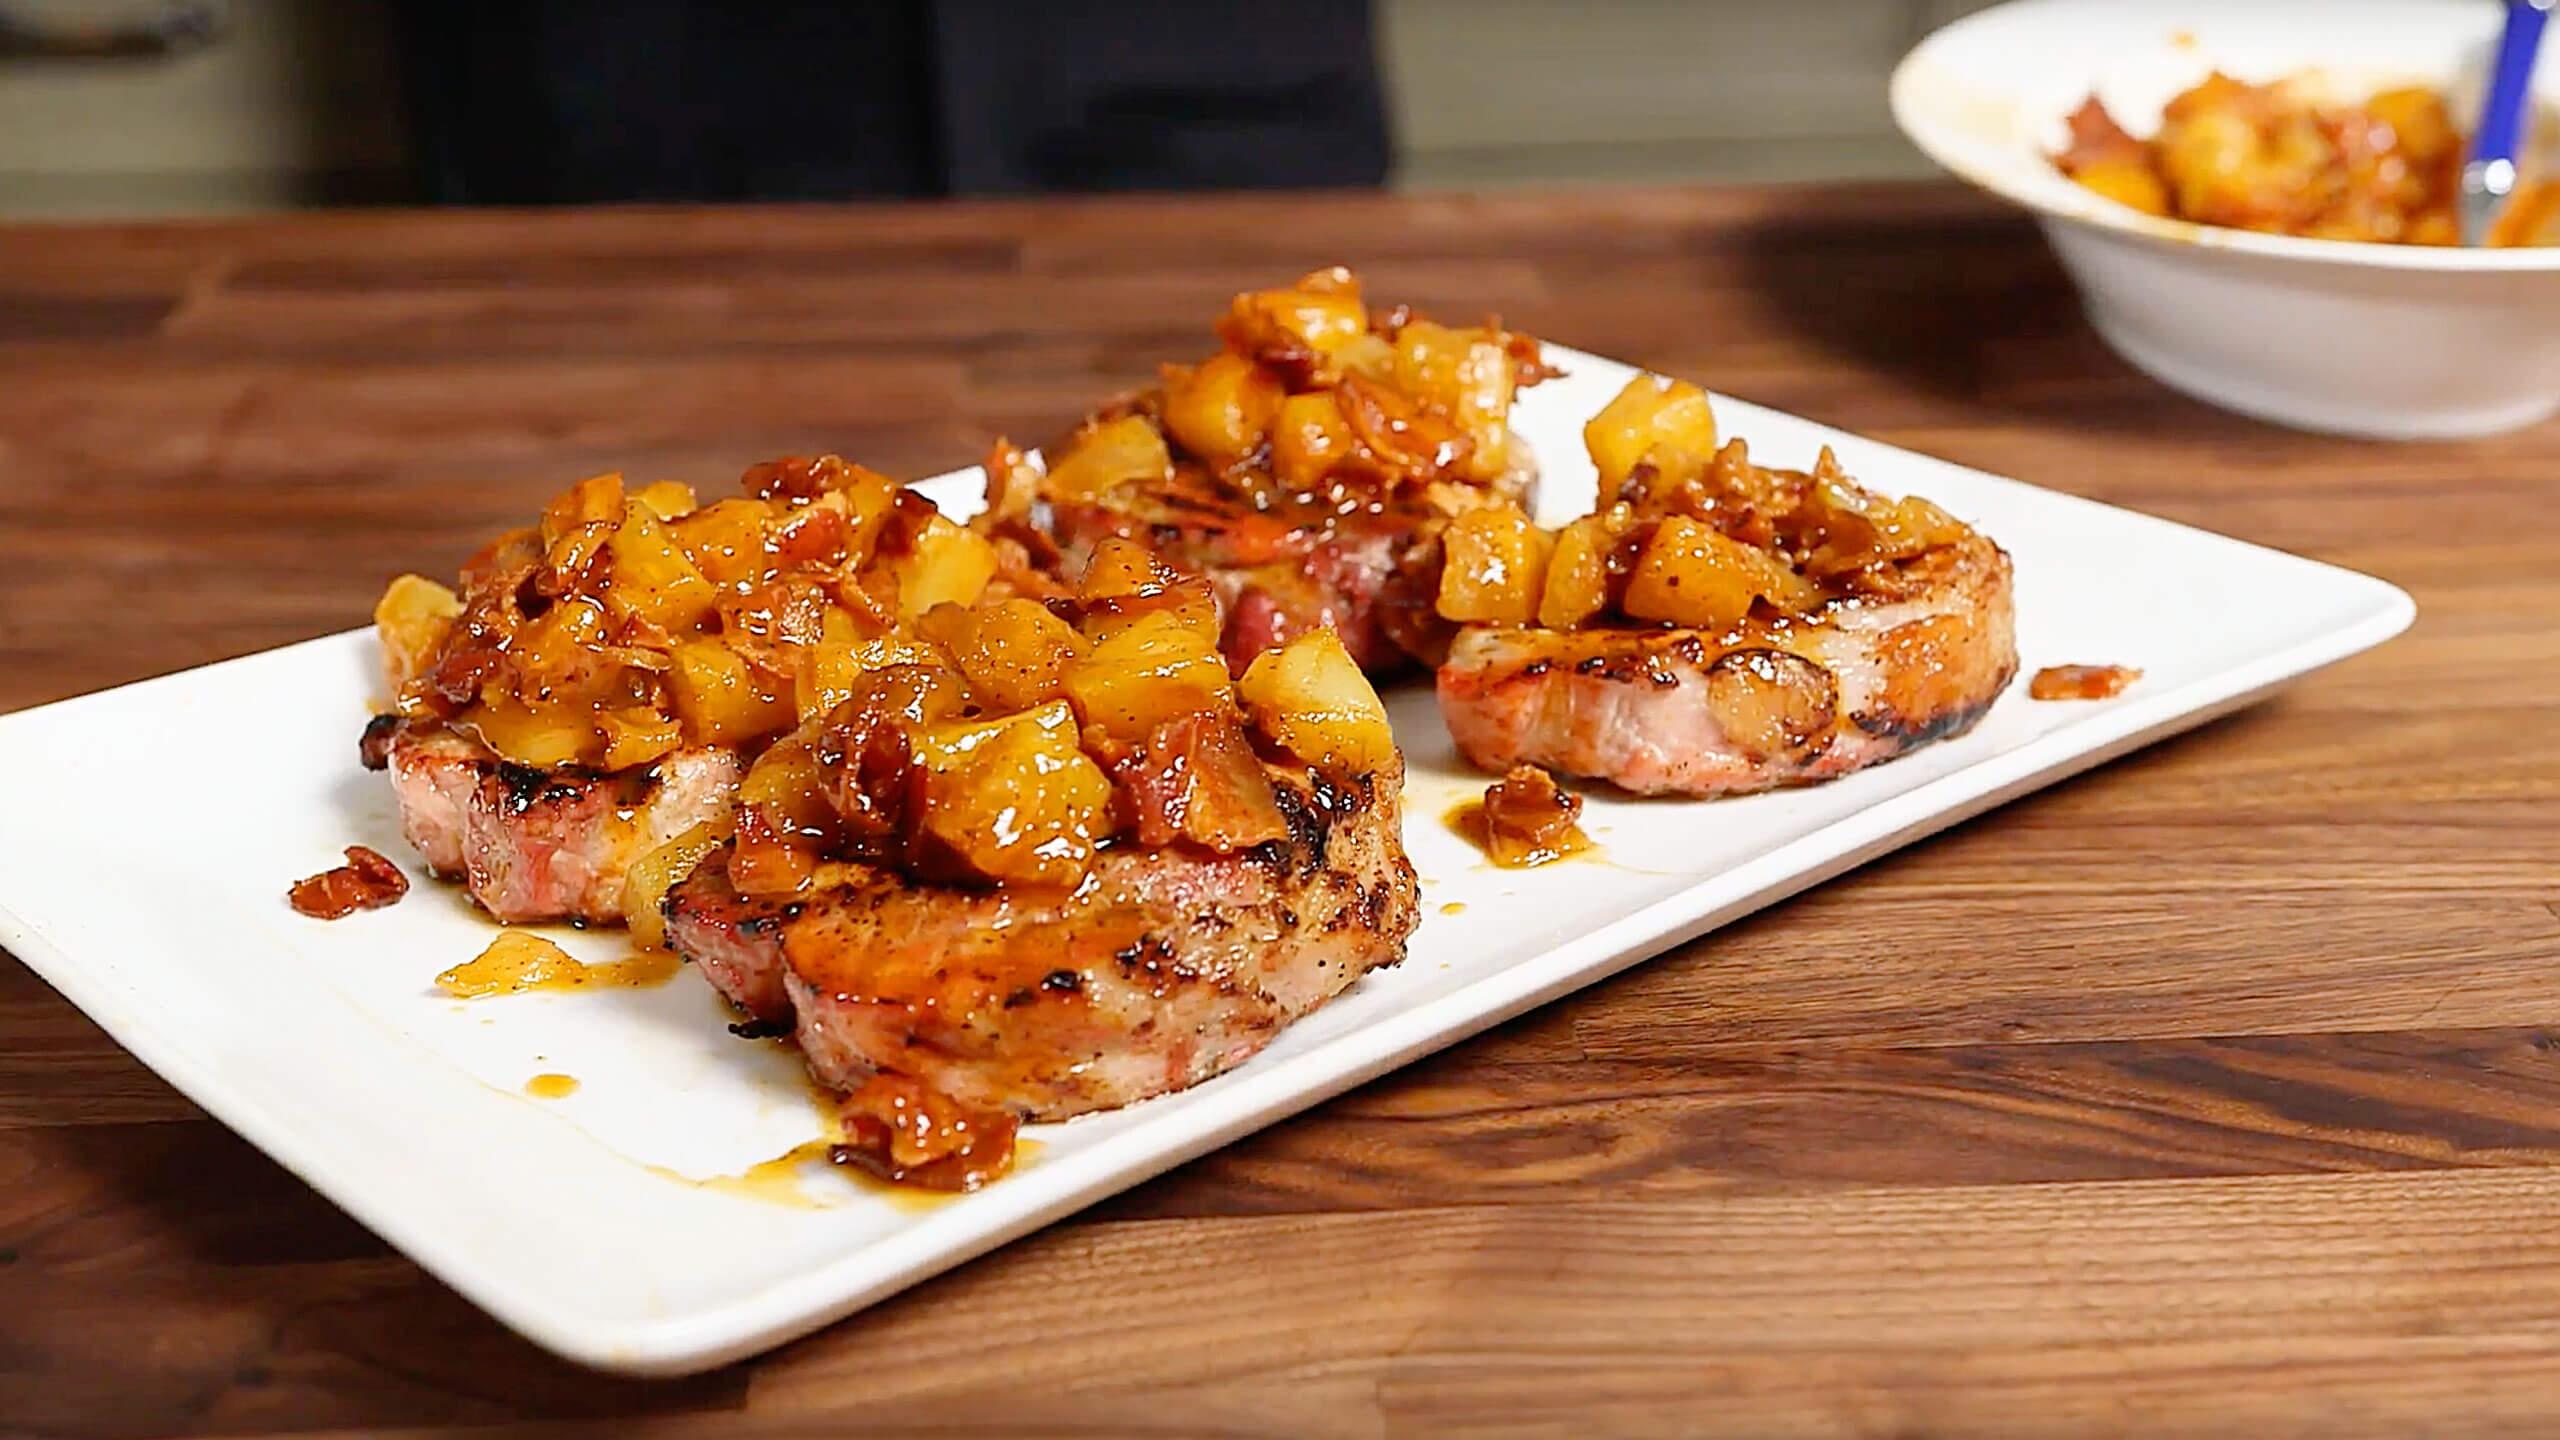 Pineapple Bacon Pork Chop